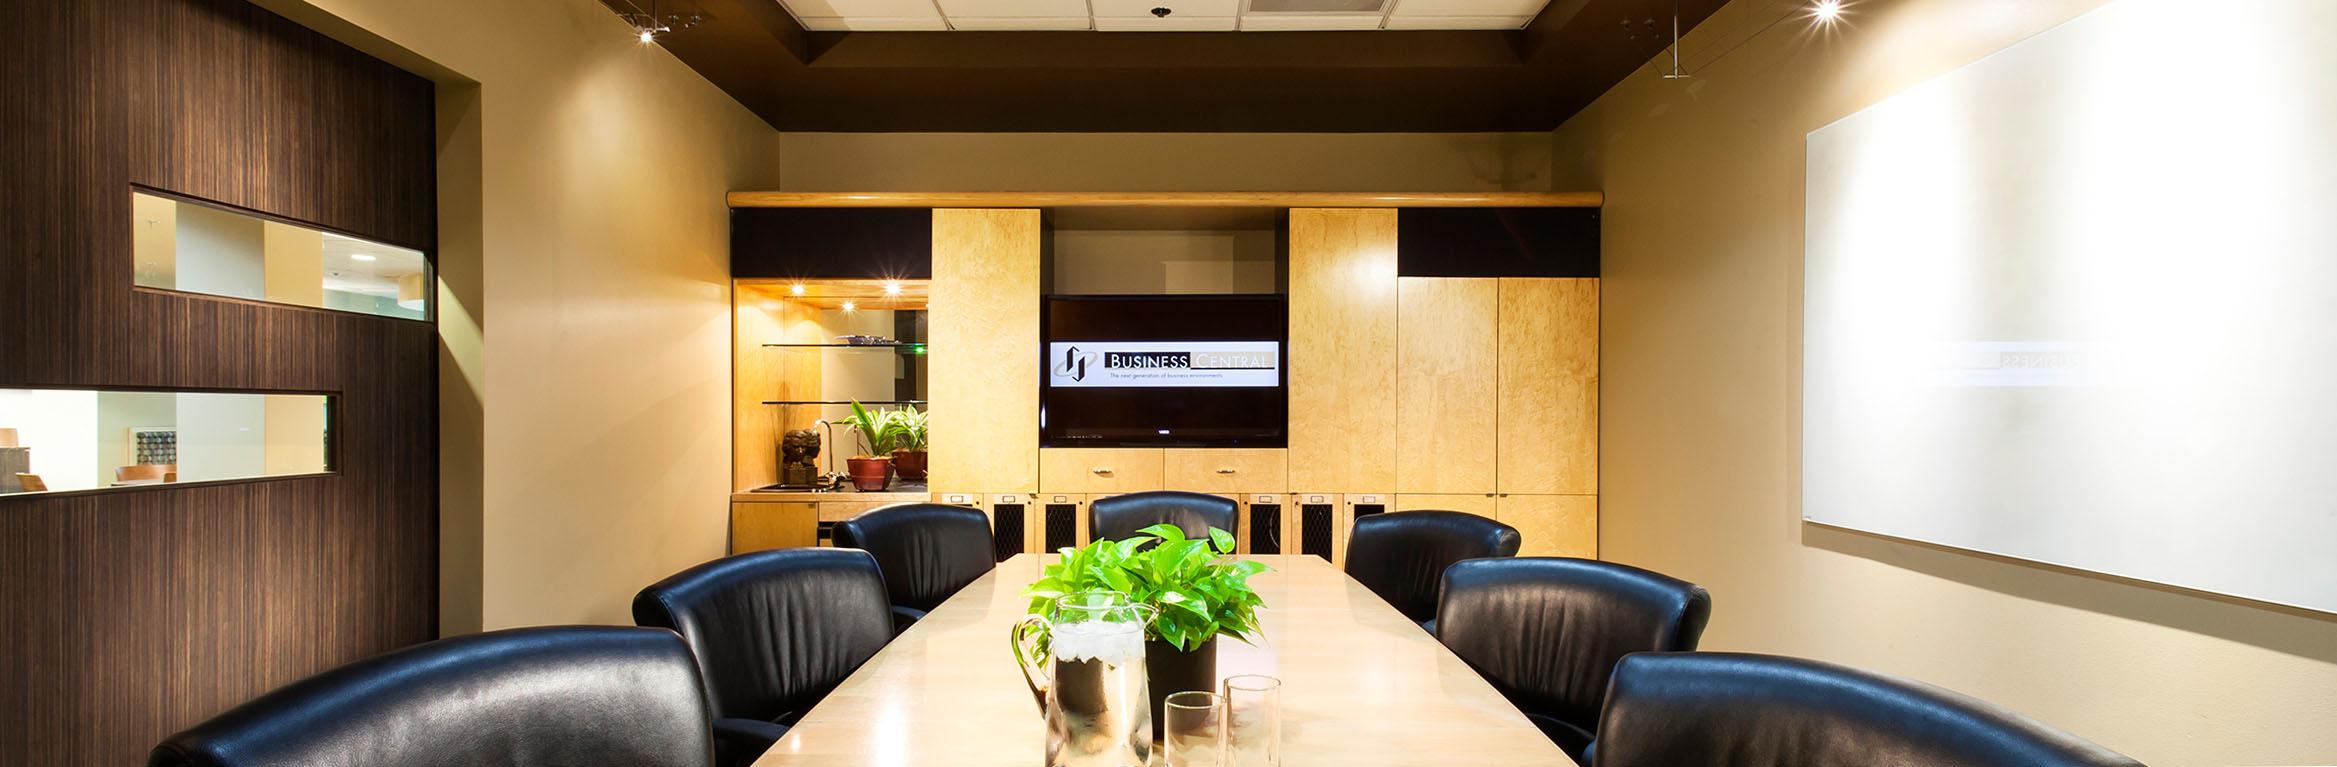 Conference Meeting Room Rentals Sacramento Folsom Ca